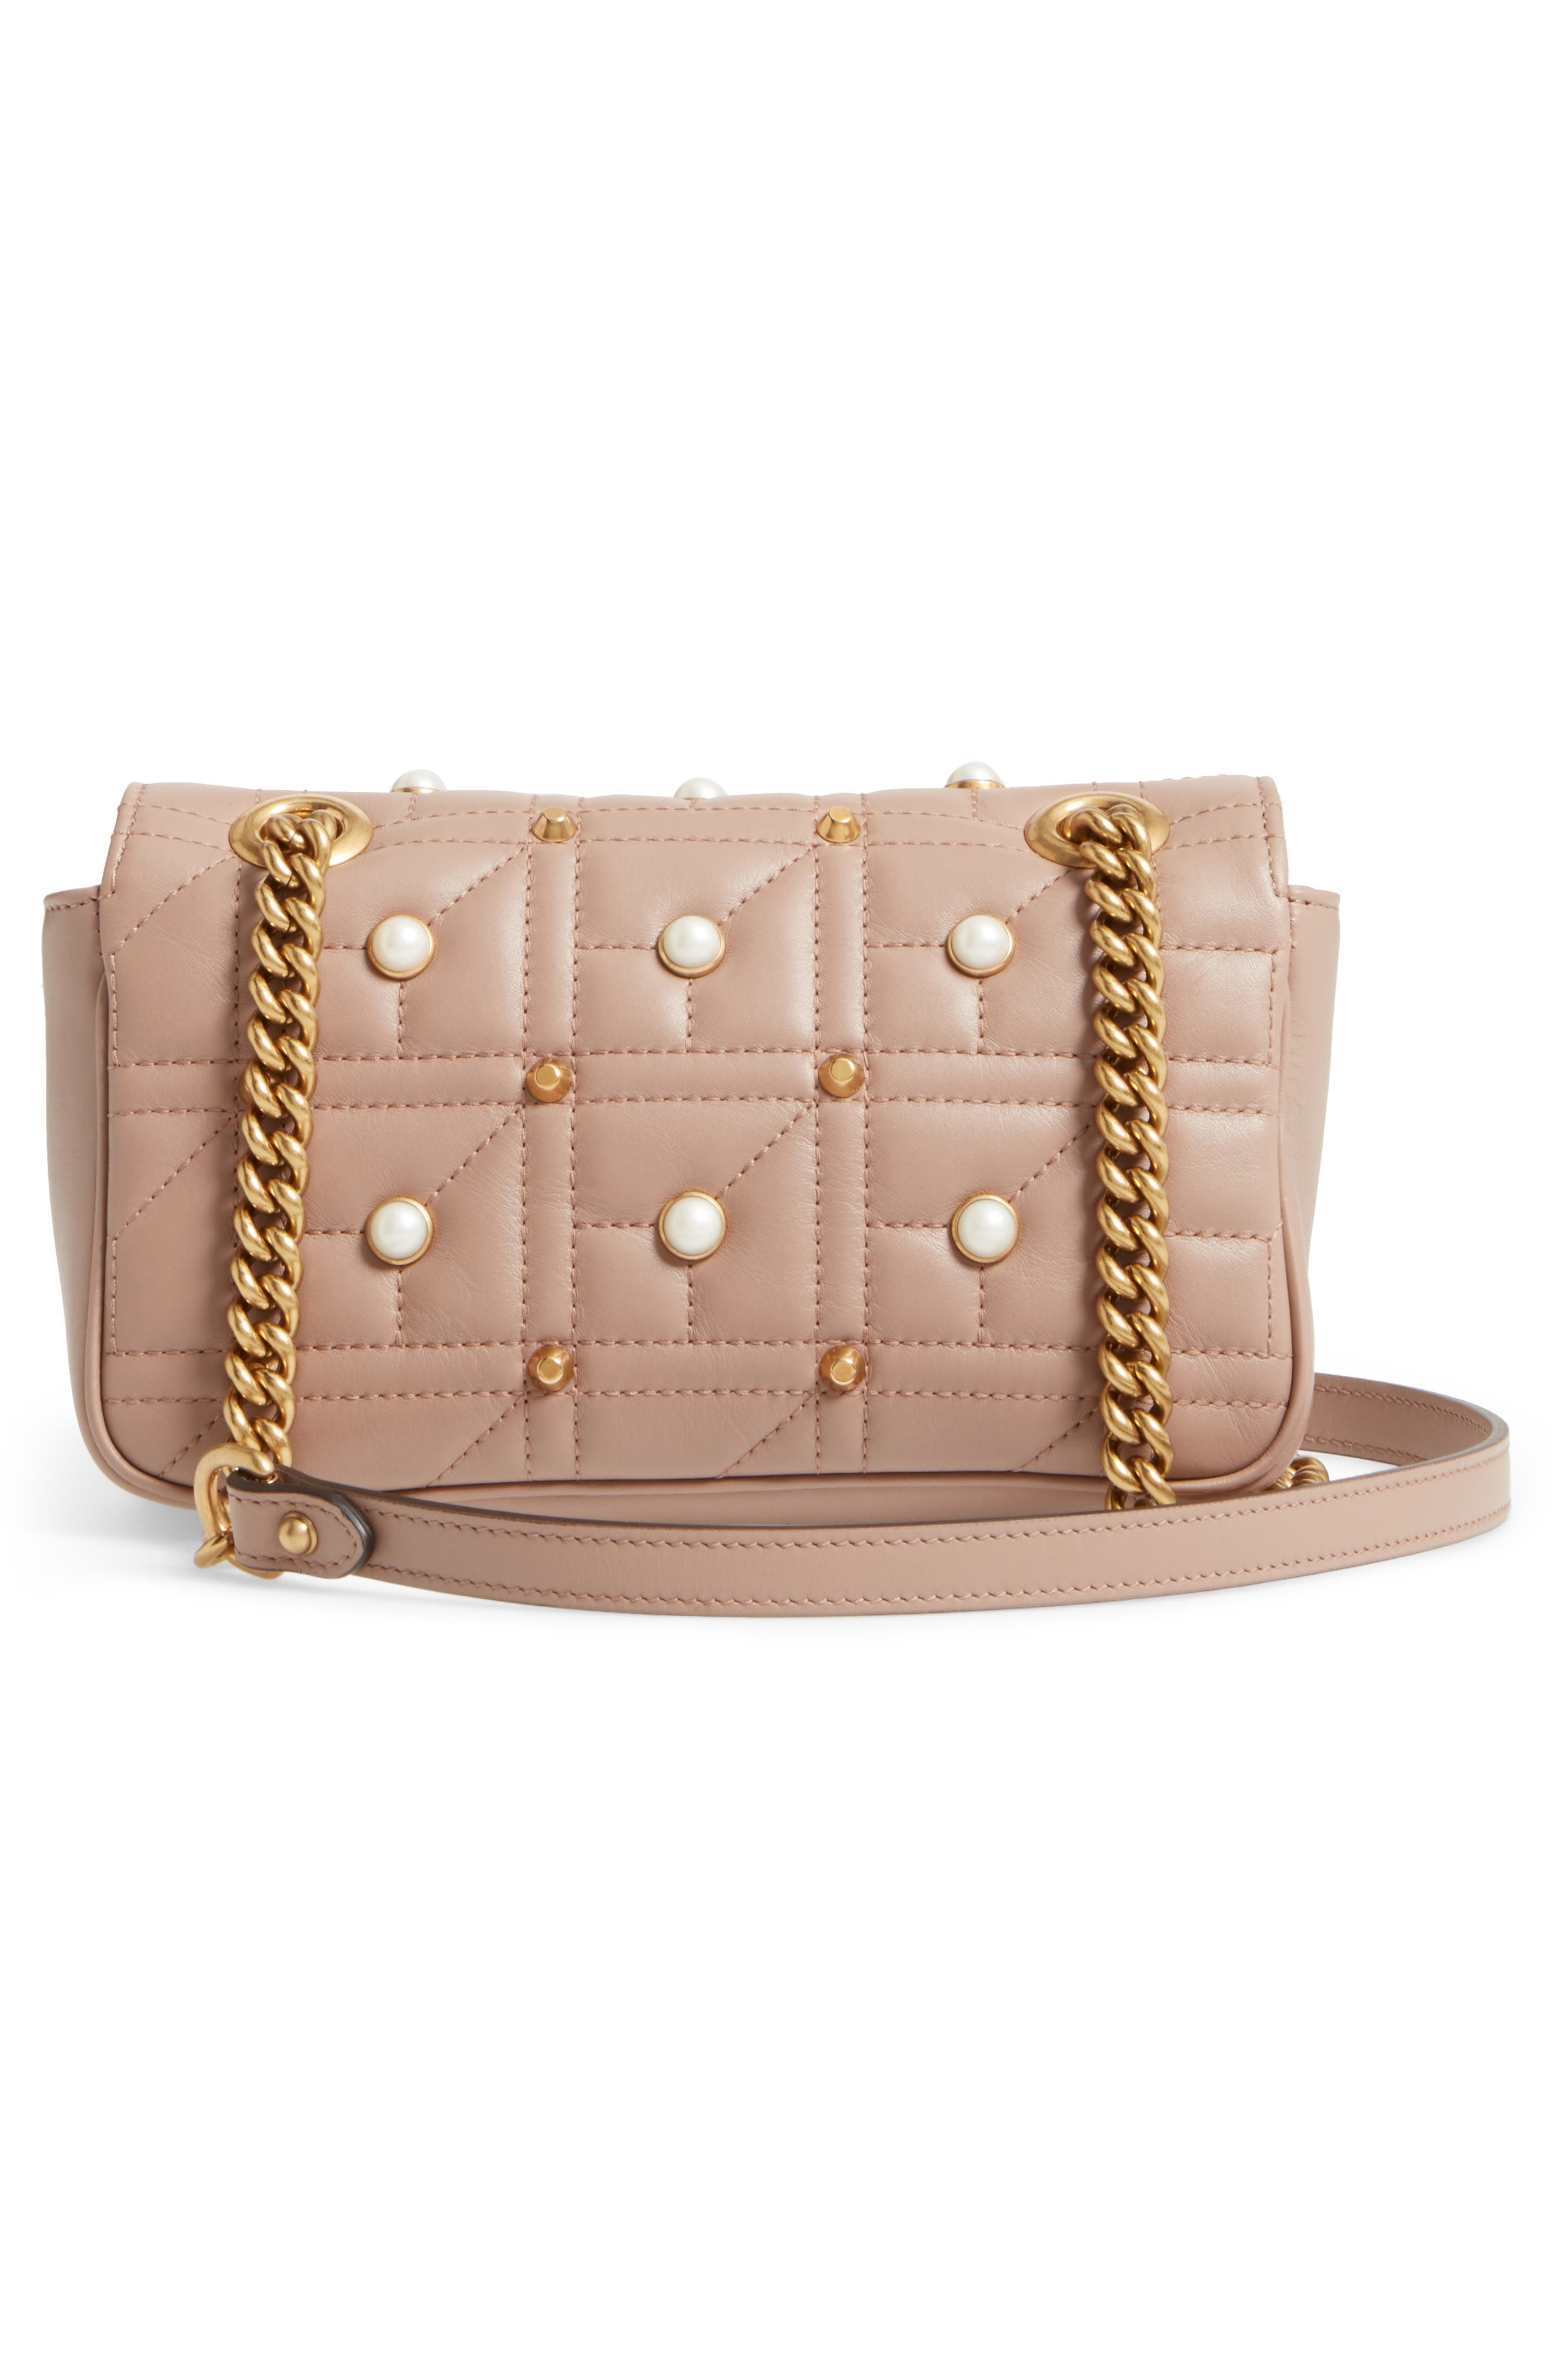 Alternate Image 3  - Gucci Mini GG Marmont 2.0 Imitation Pearl Logo Matelassé Leather Shoulder Bag